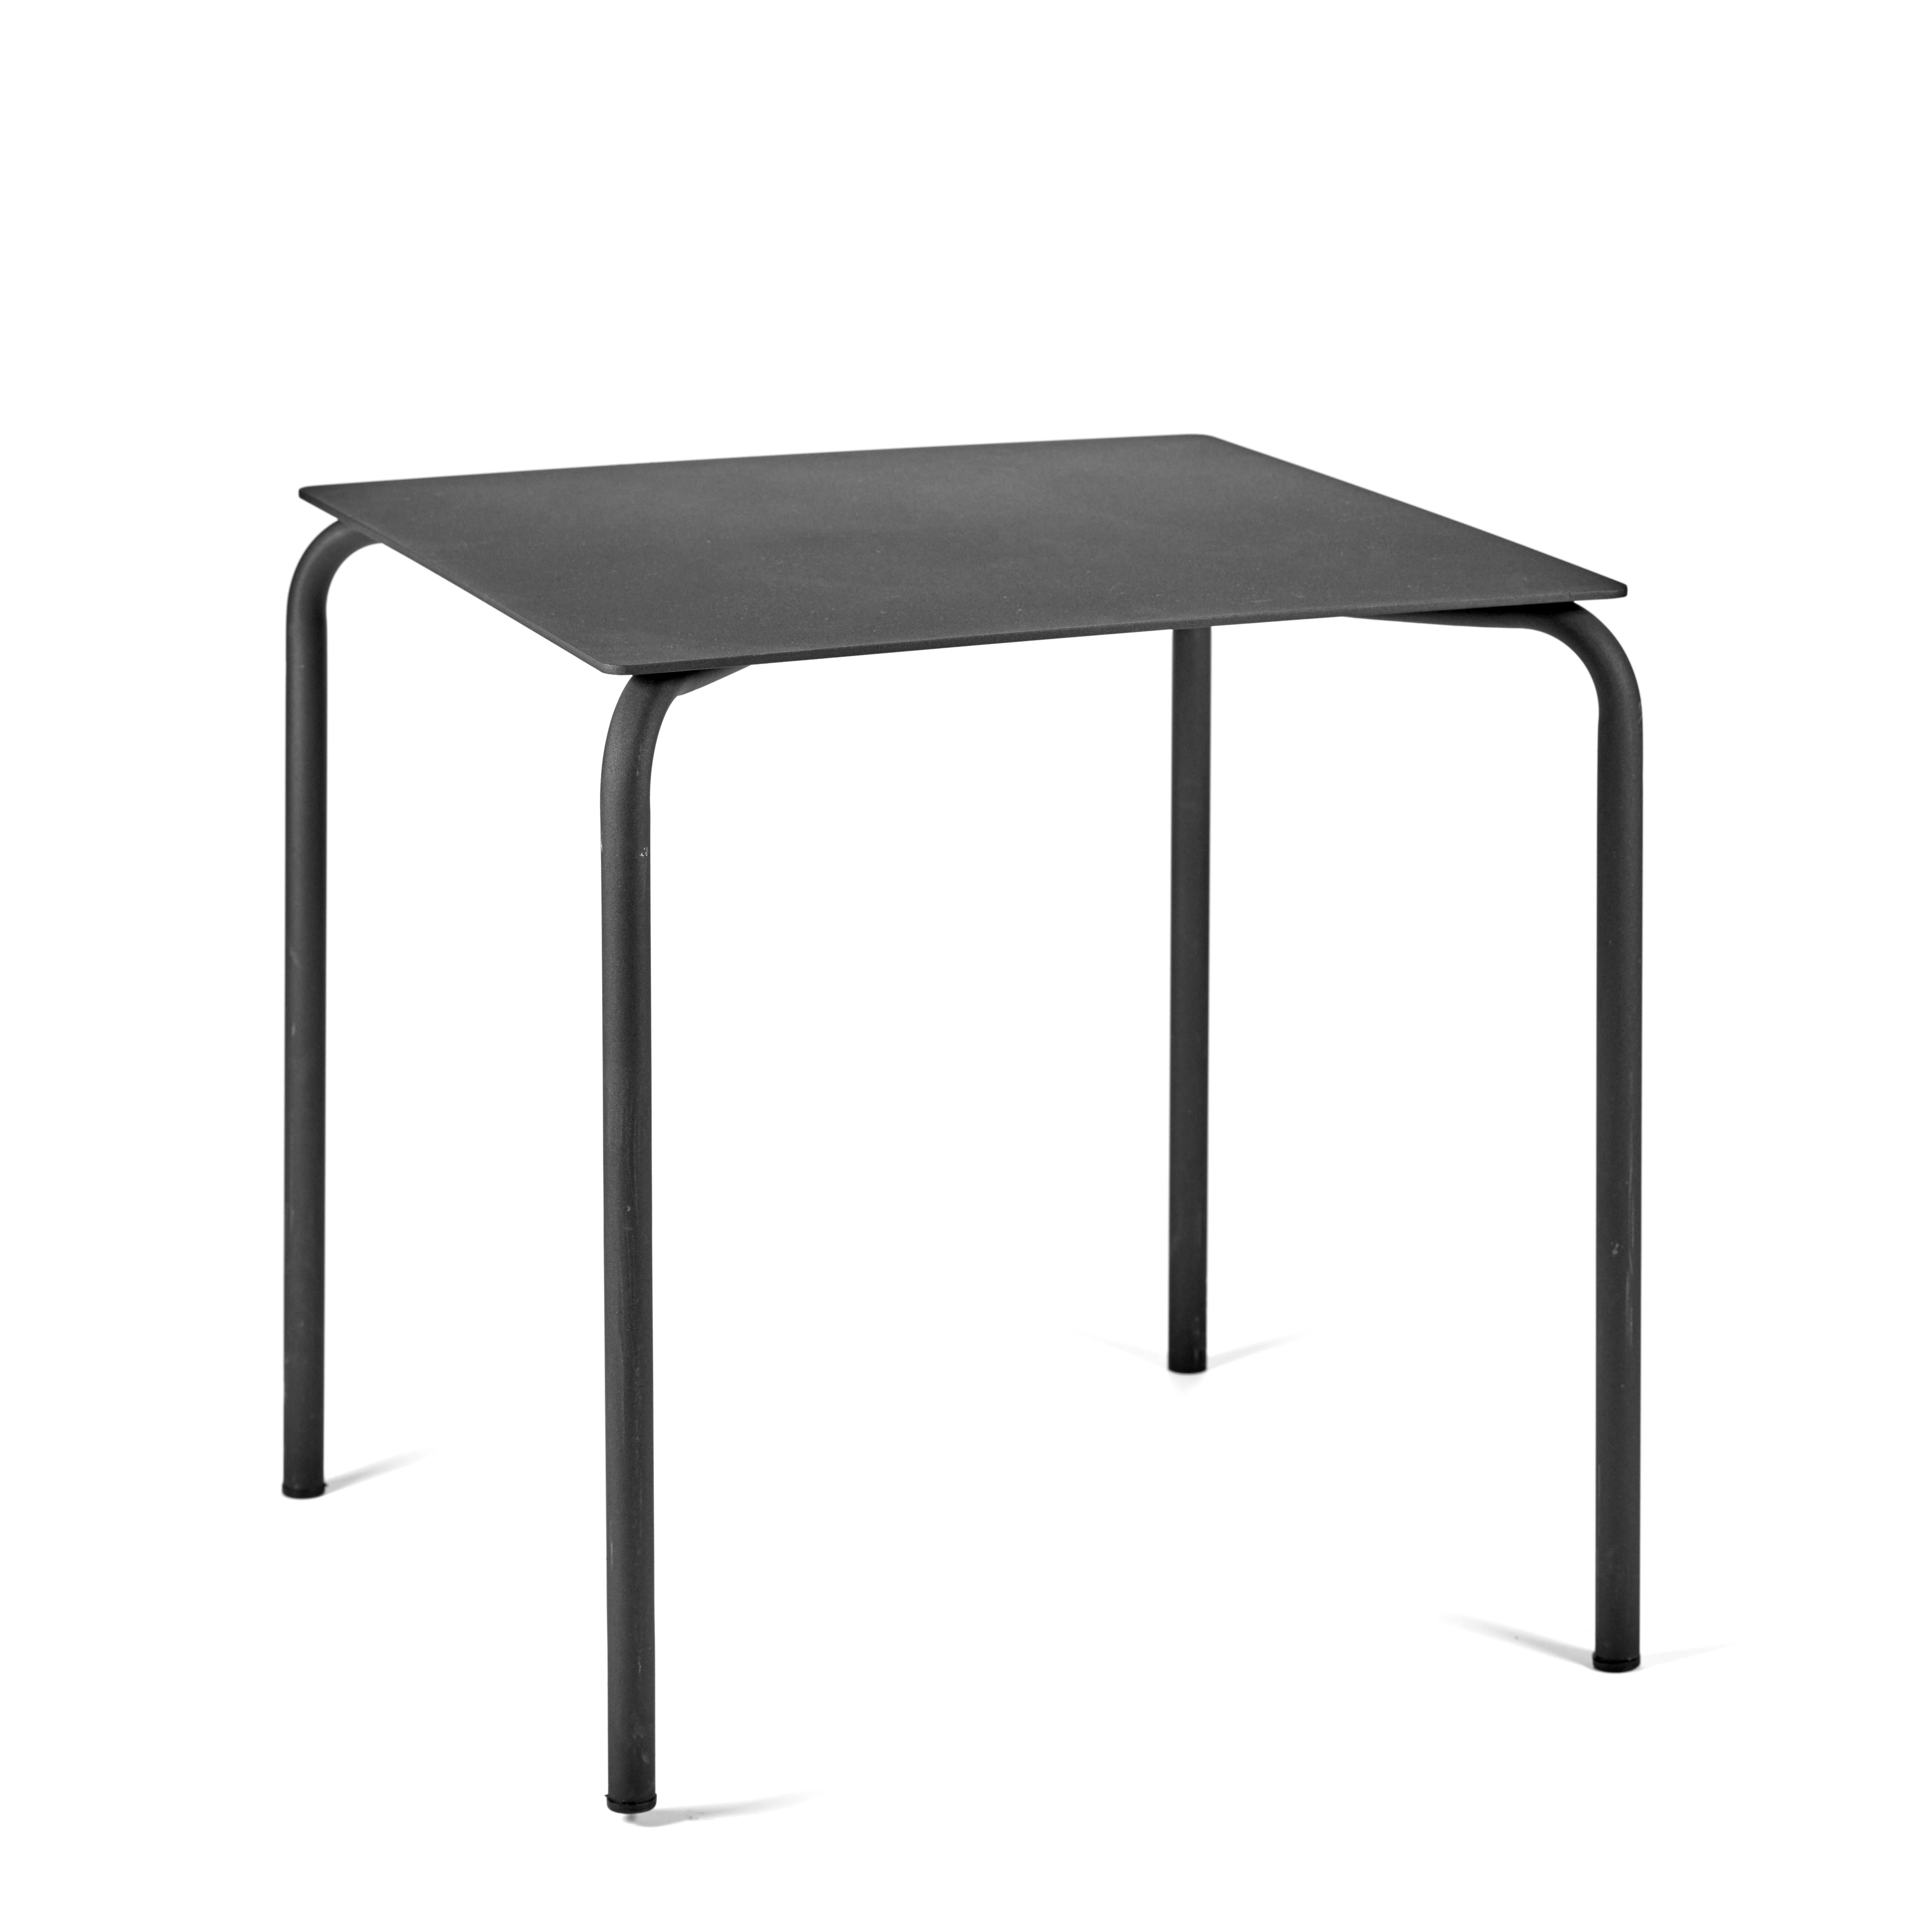 Outdoor - Garden Tables - August Table - / Aluminium - 70 x 70 cm by Serax - Black - Thermolacquered aluminium